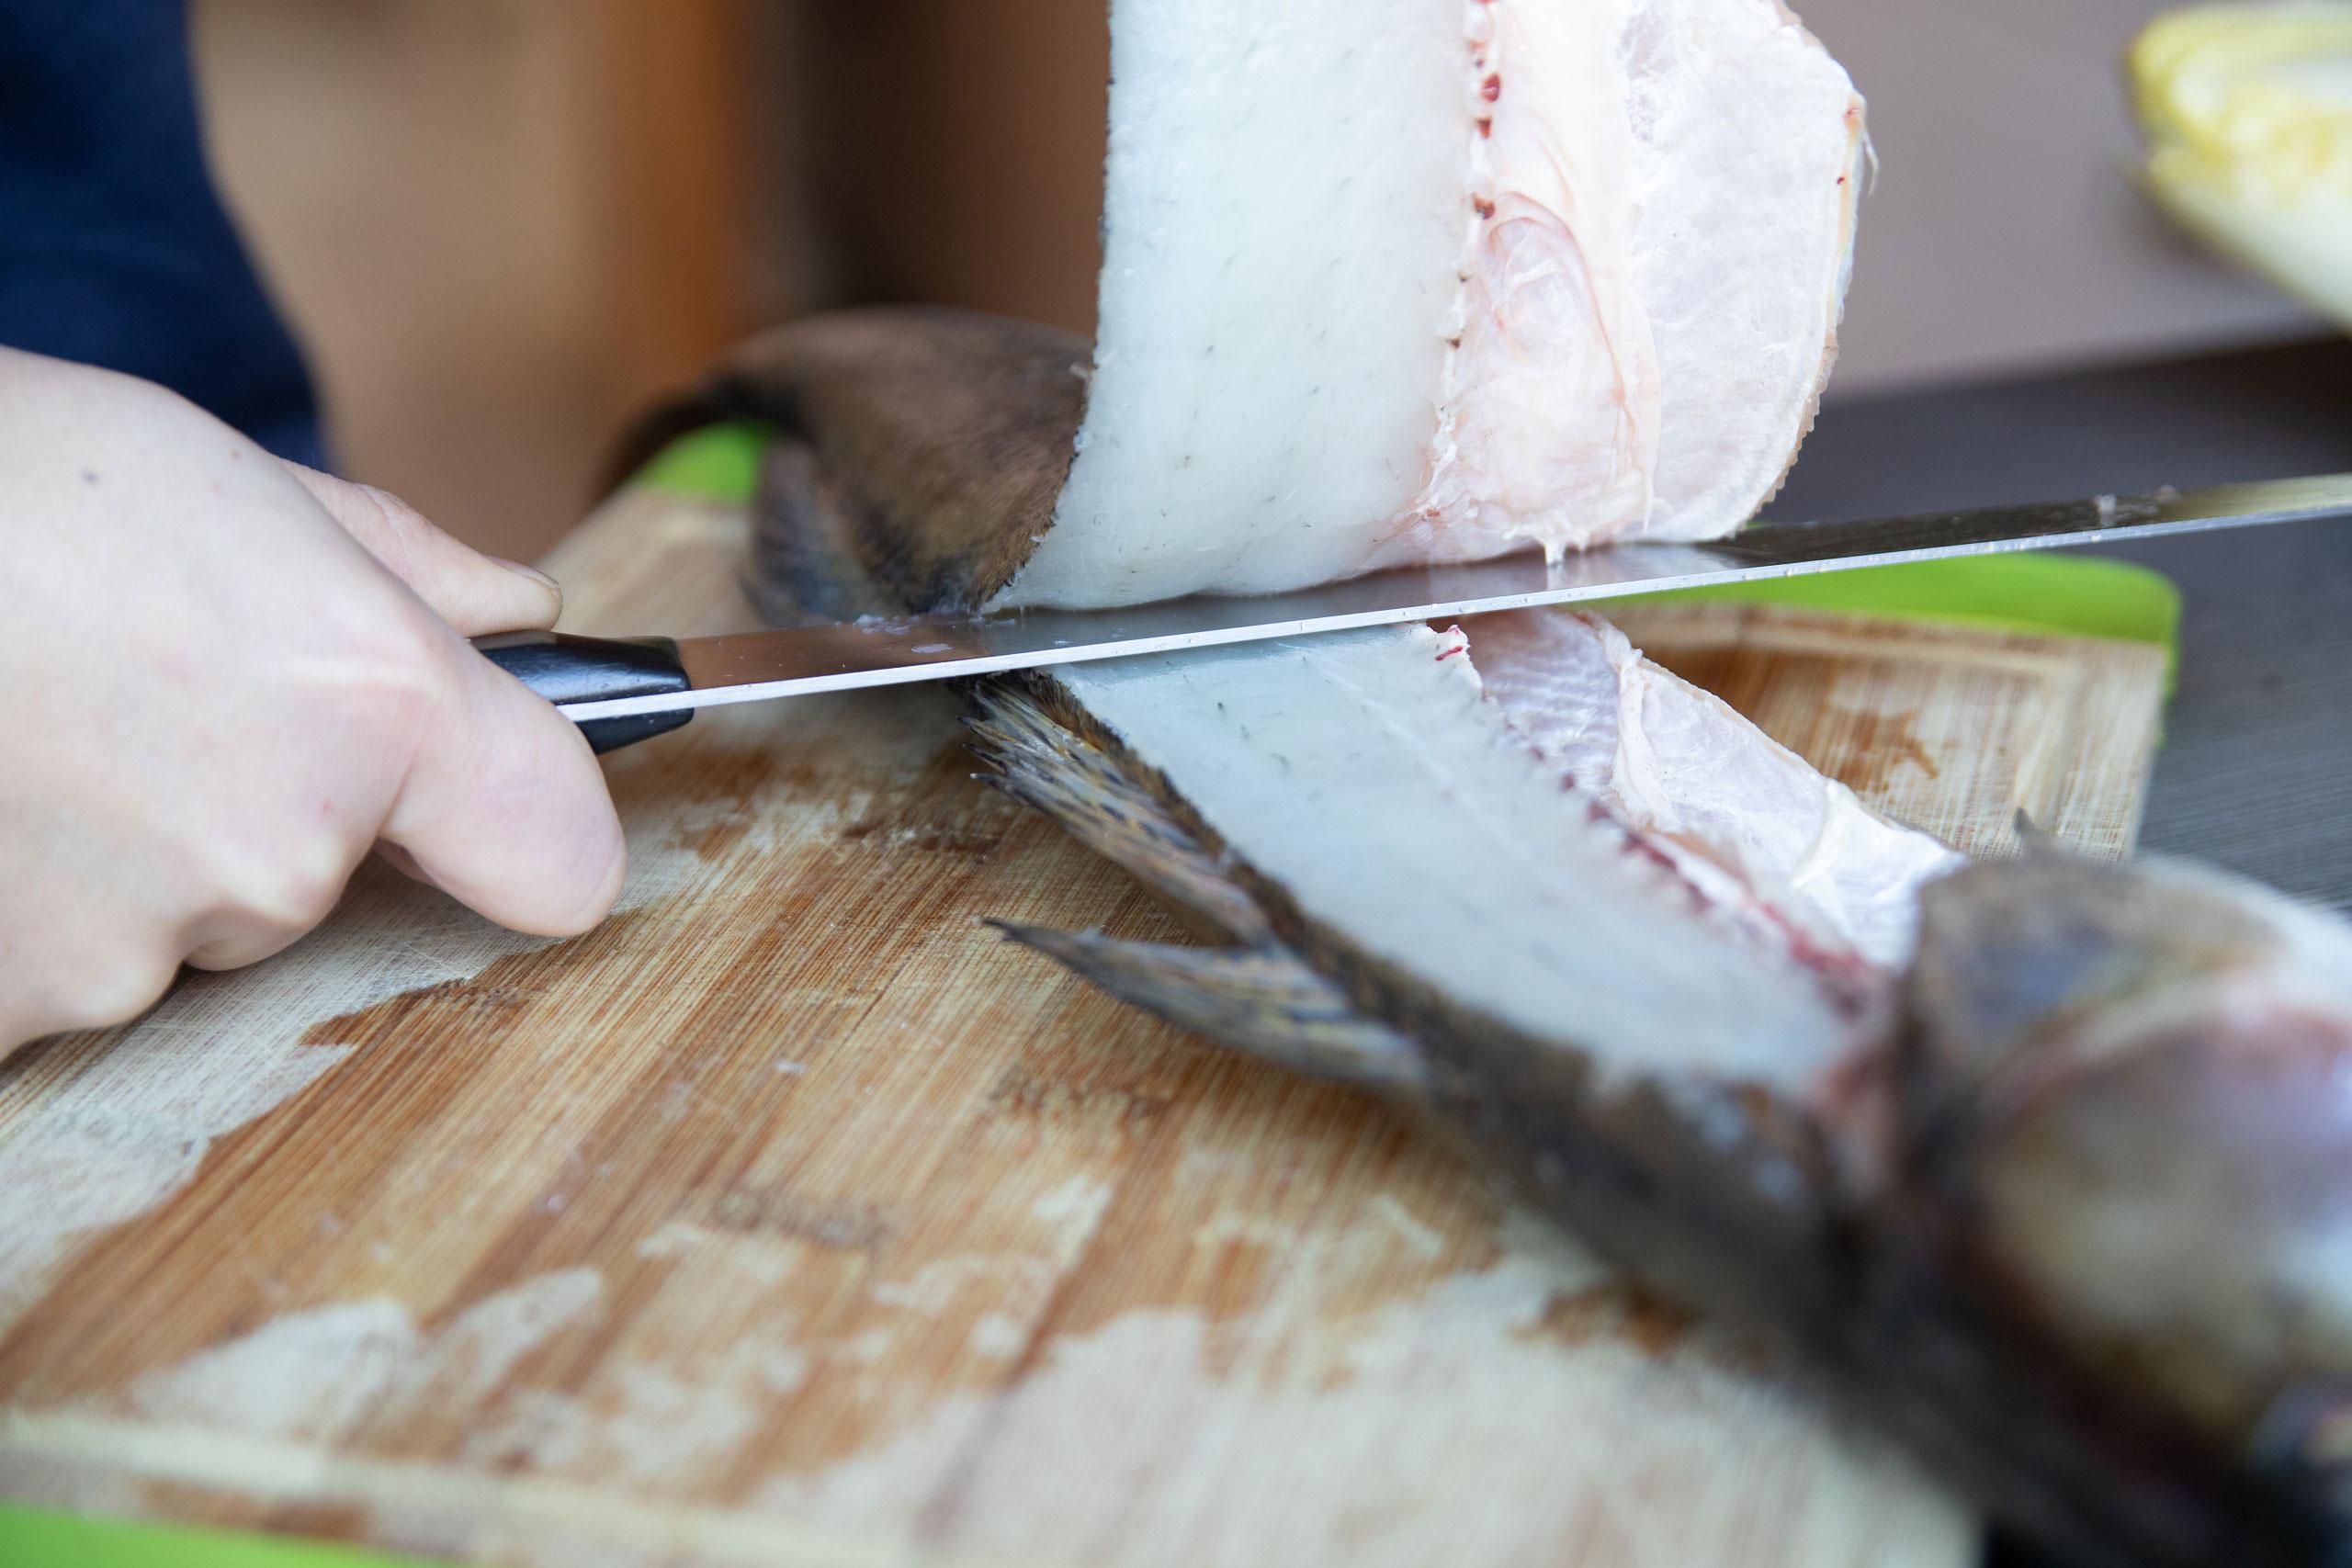 Catch and Cook - Zander filetieren